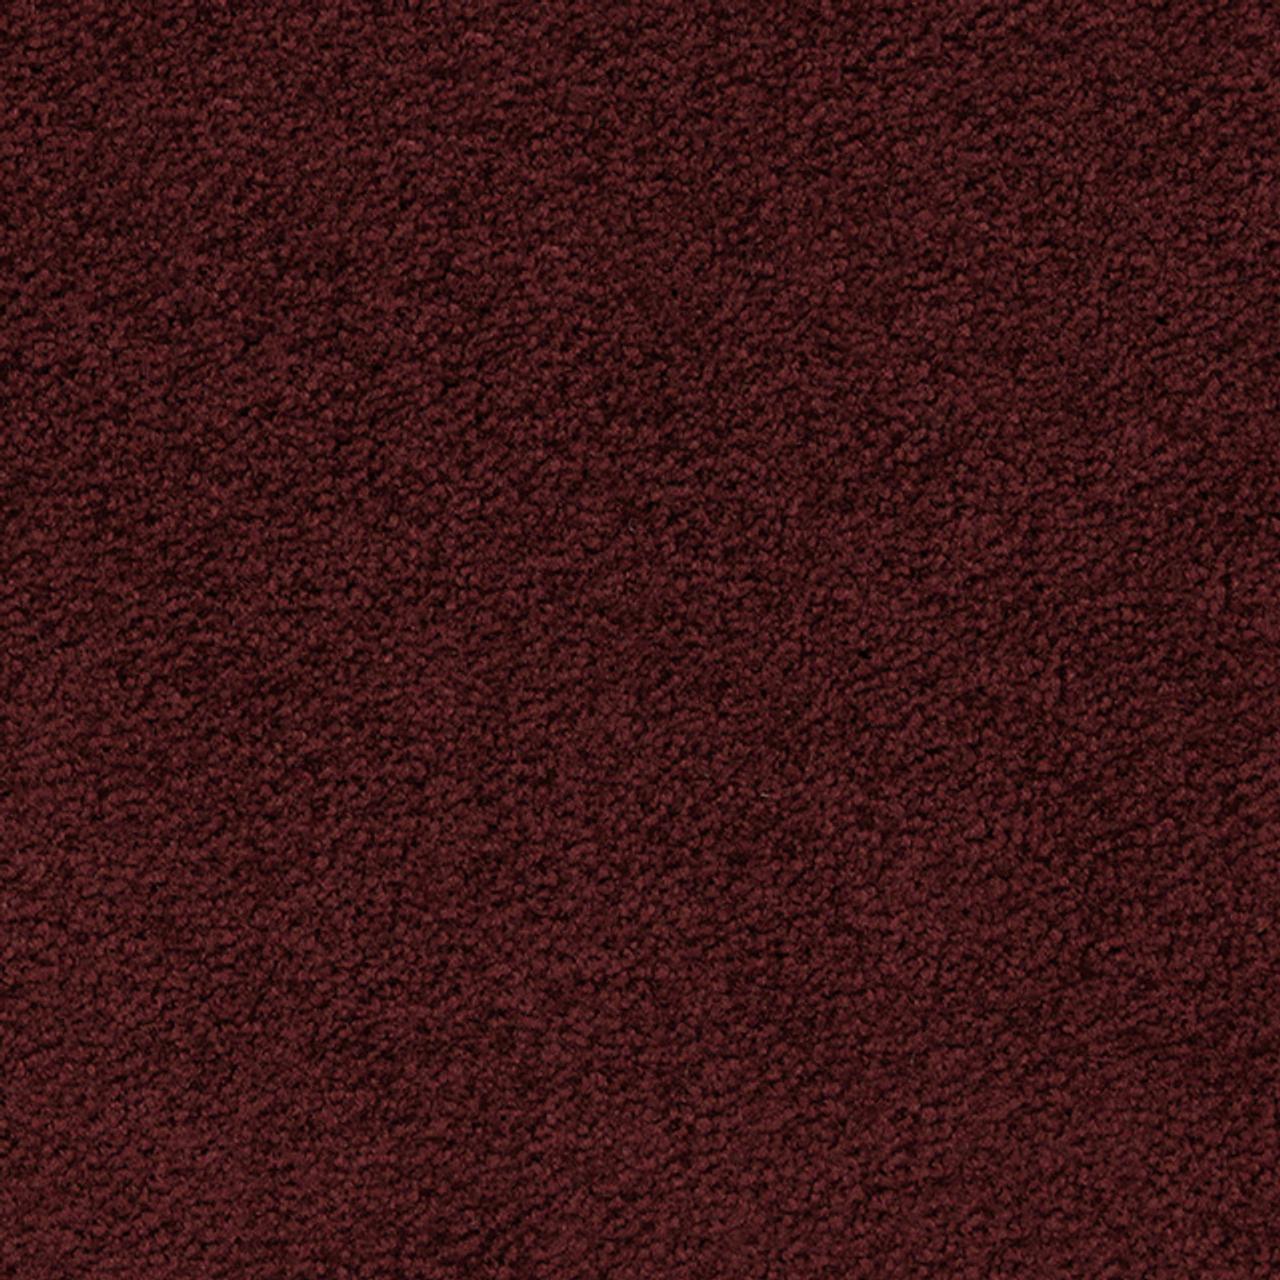 440 - Dark Burgundy